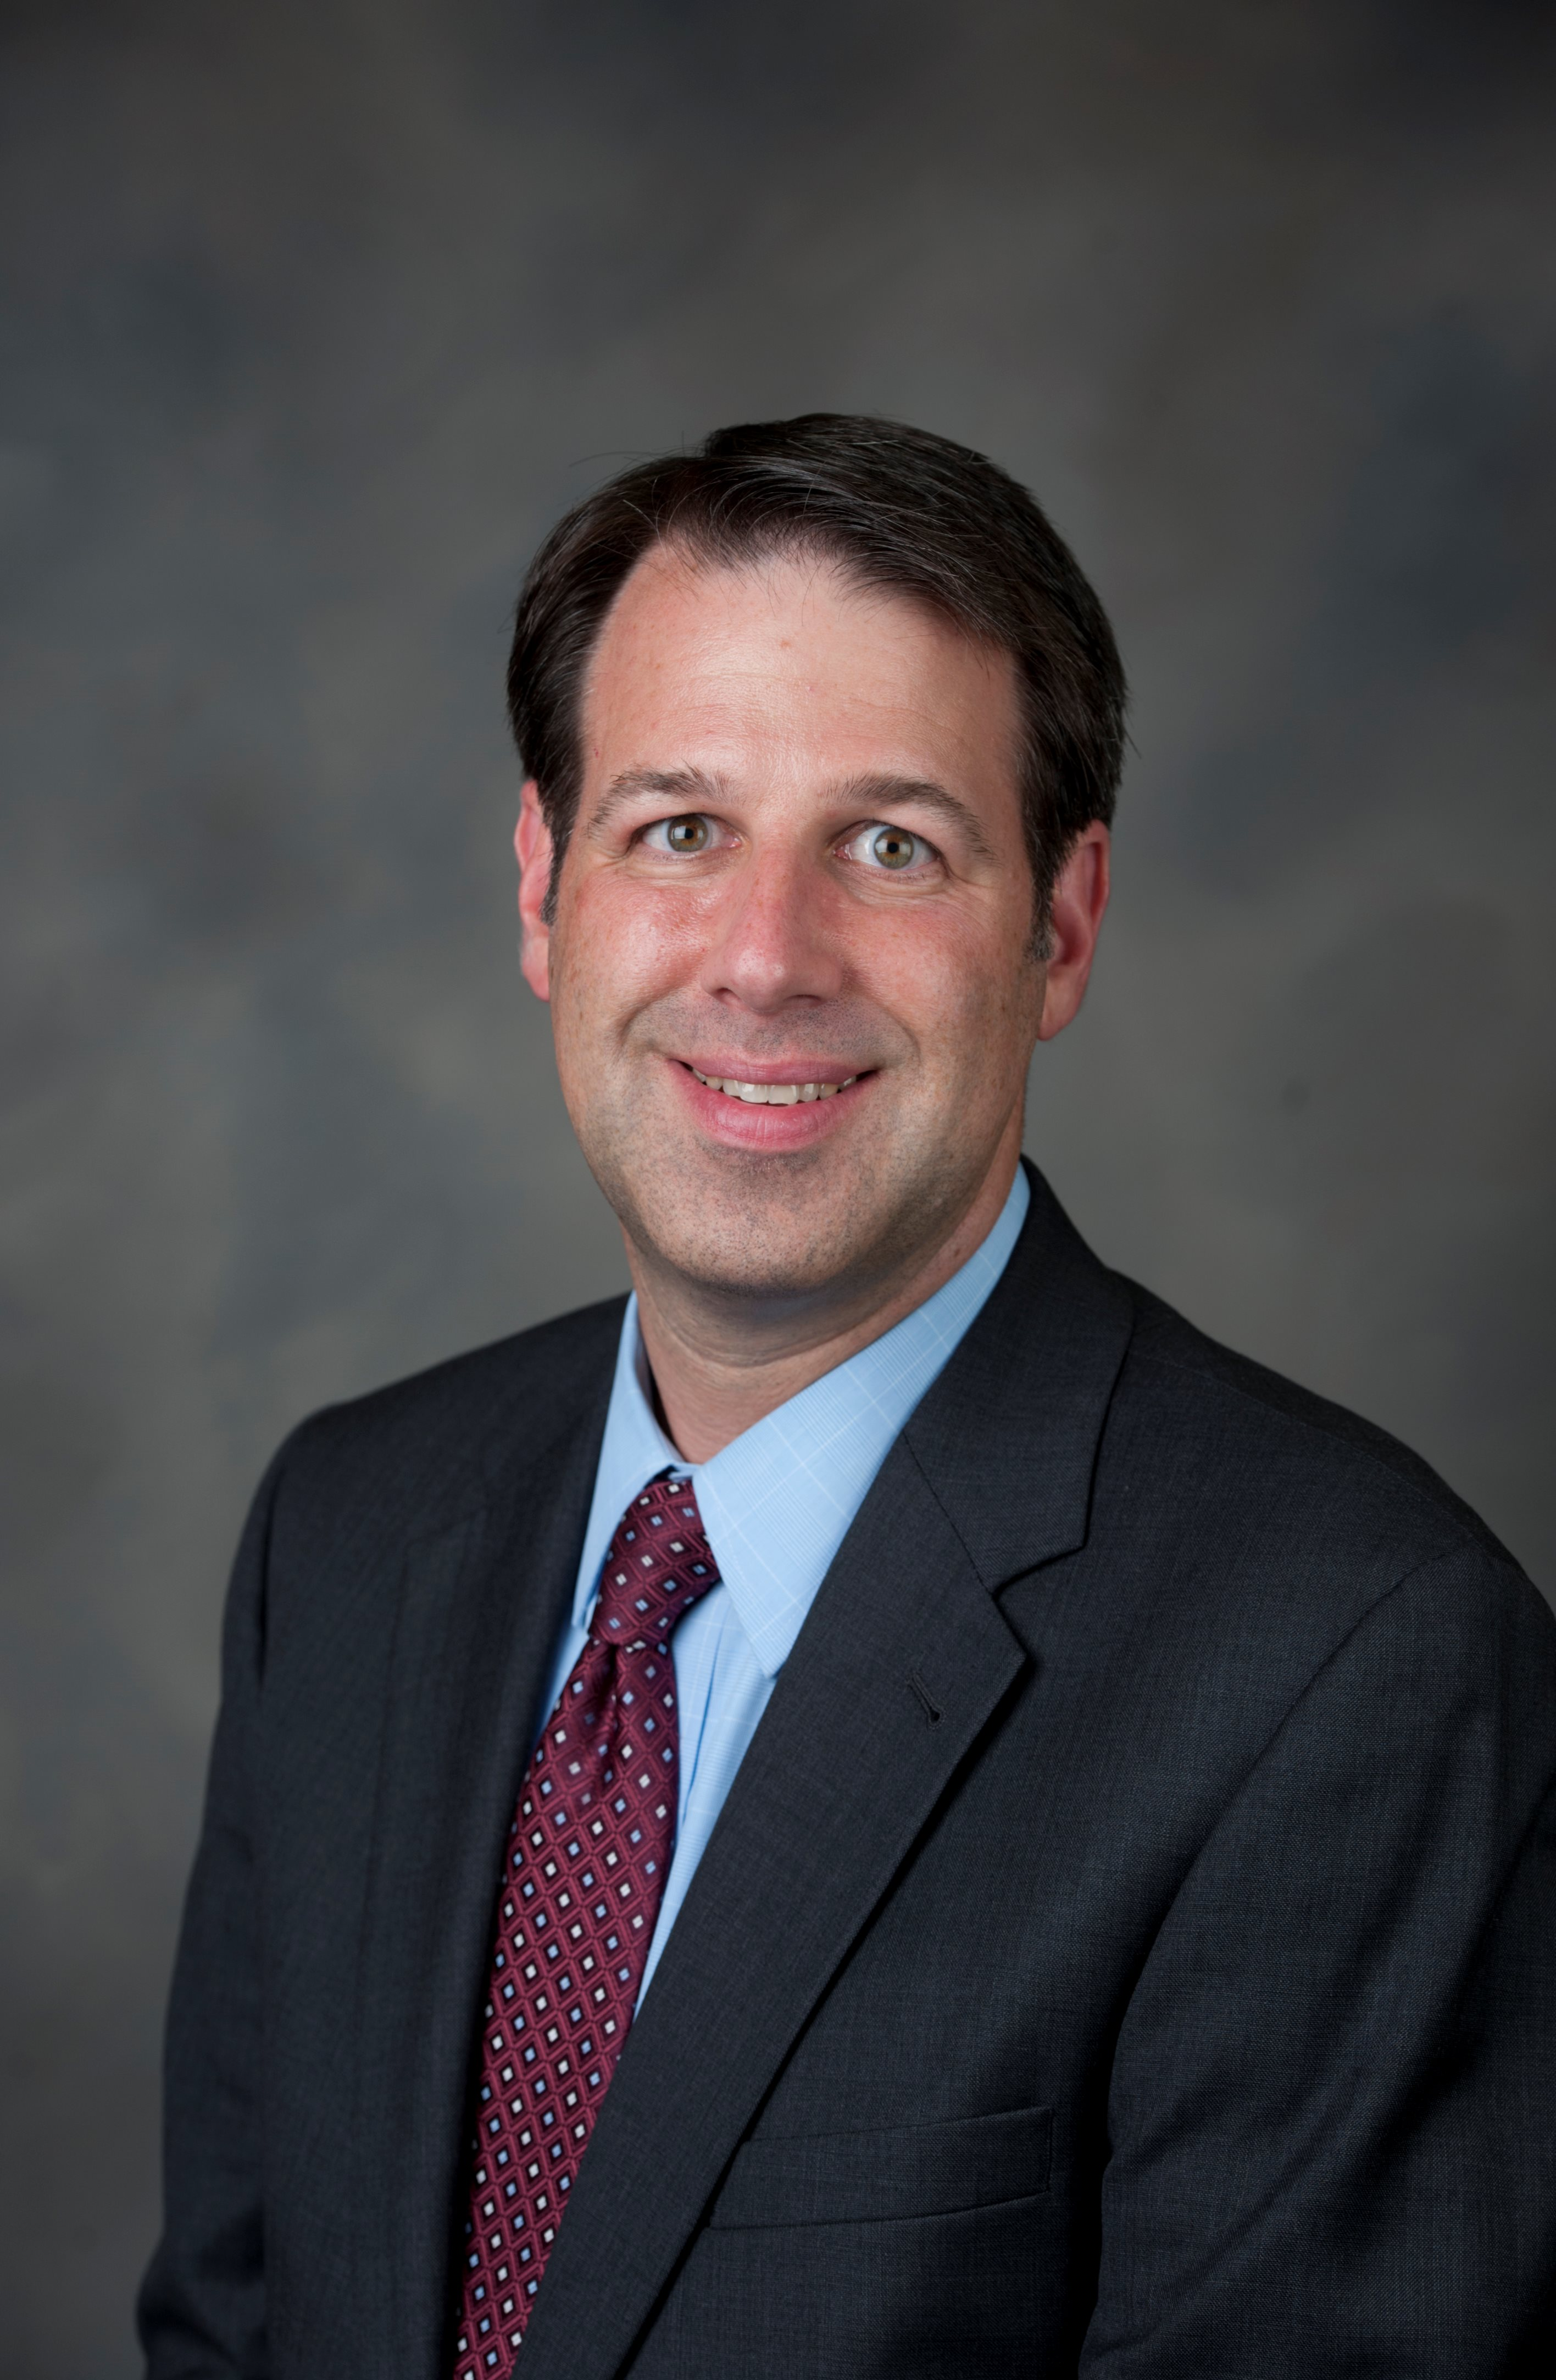 Dr. Jon Dooley